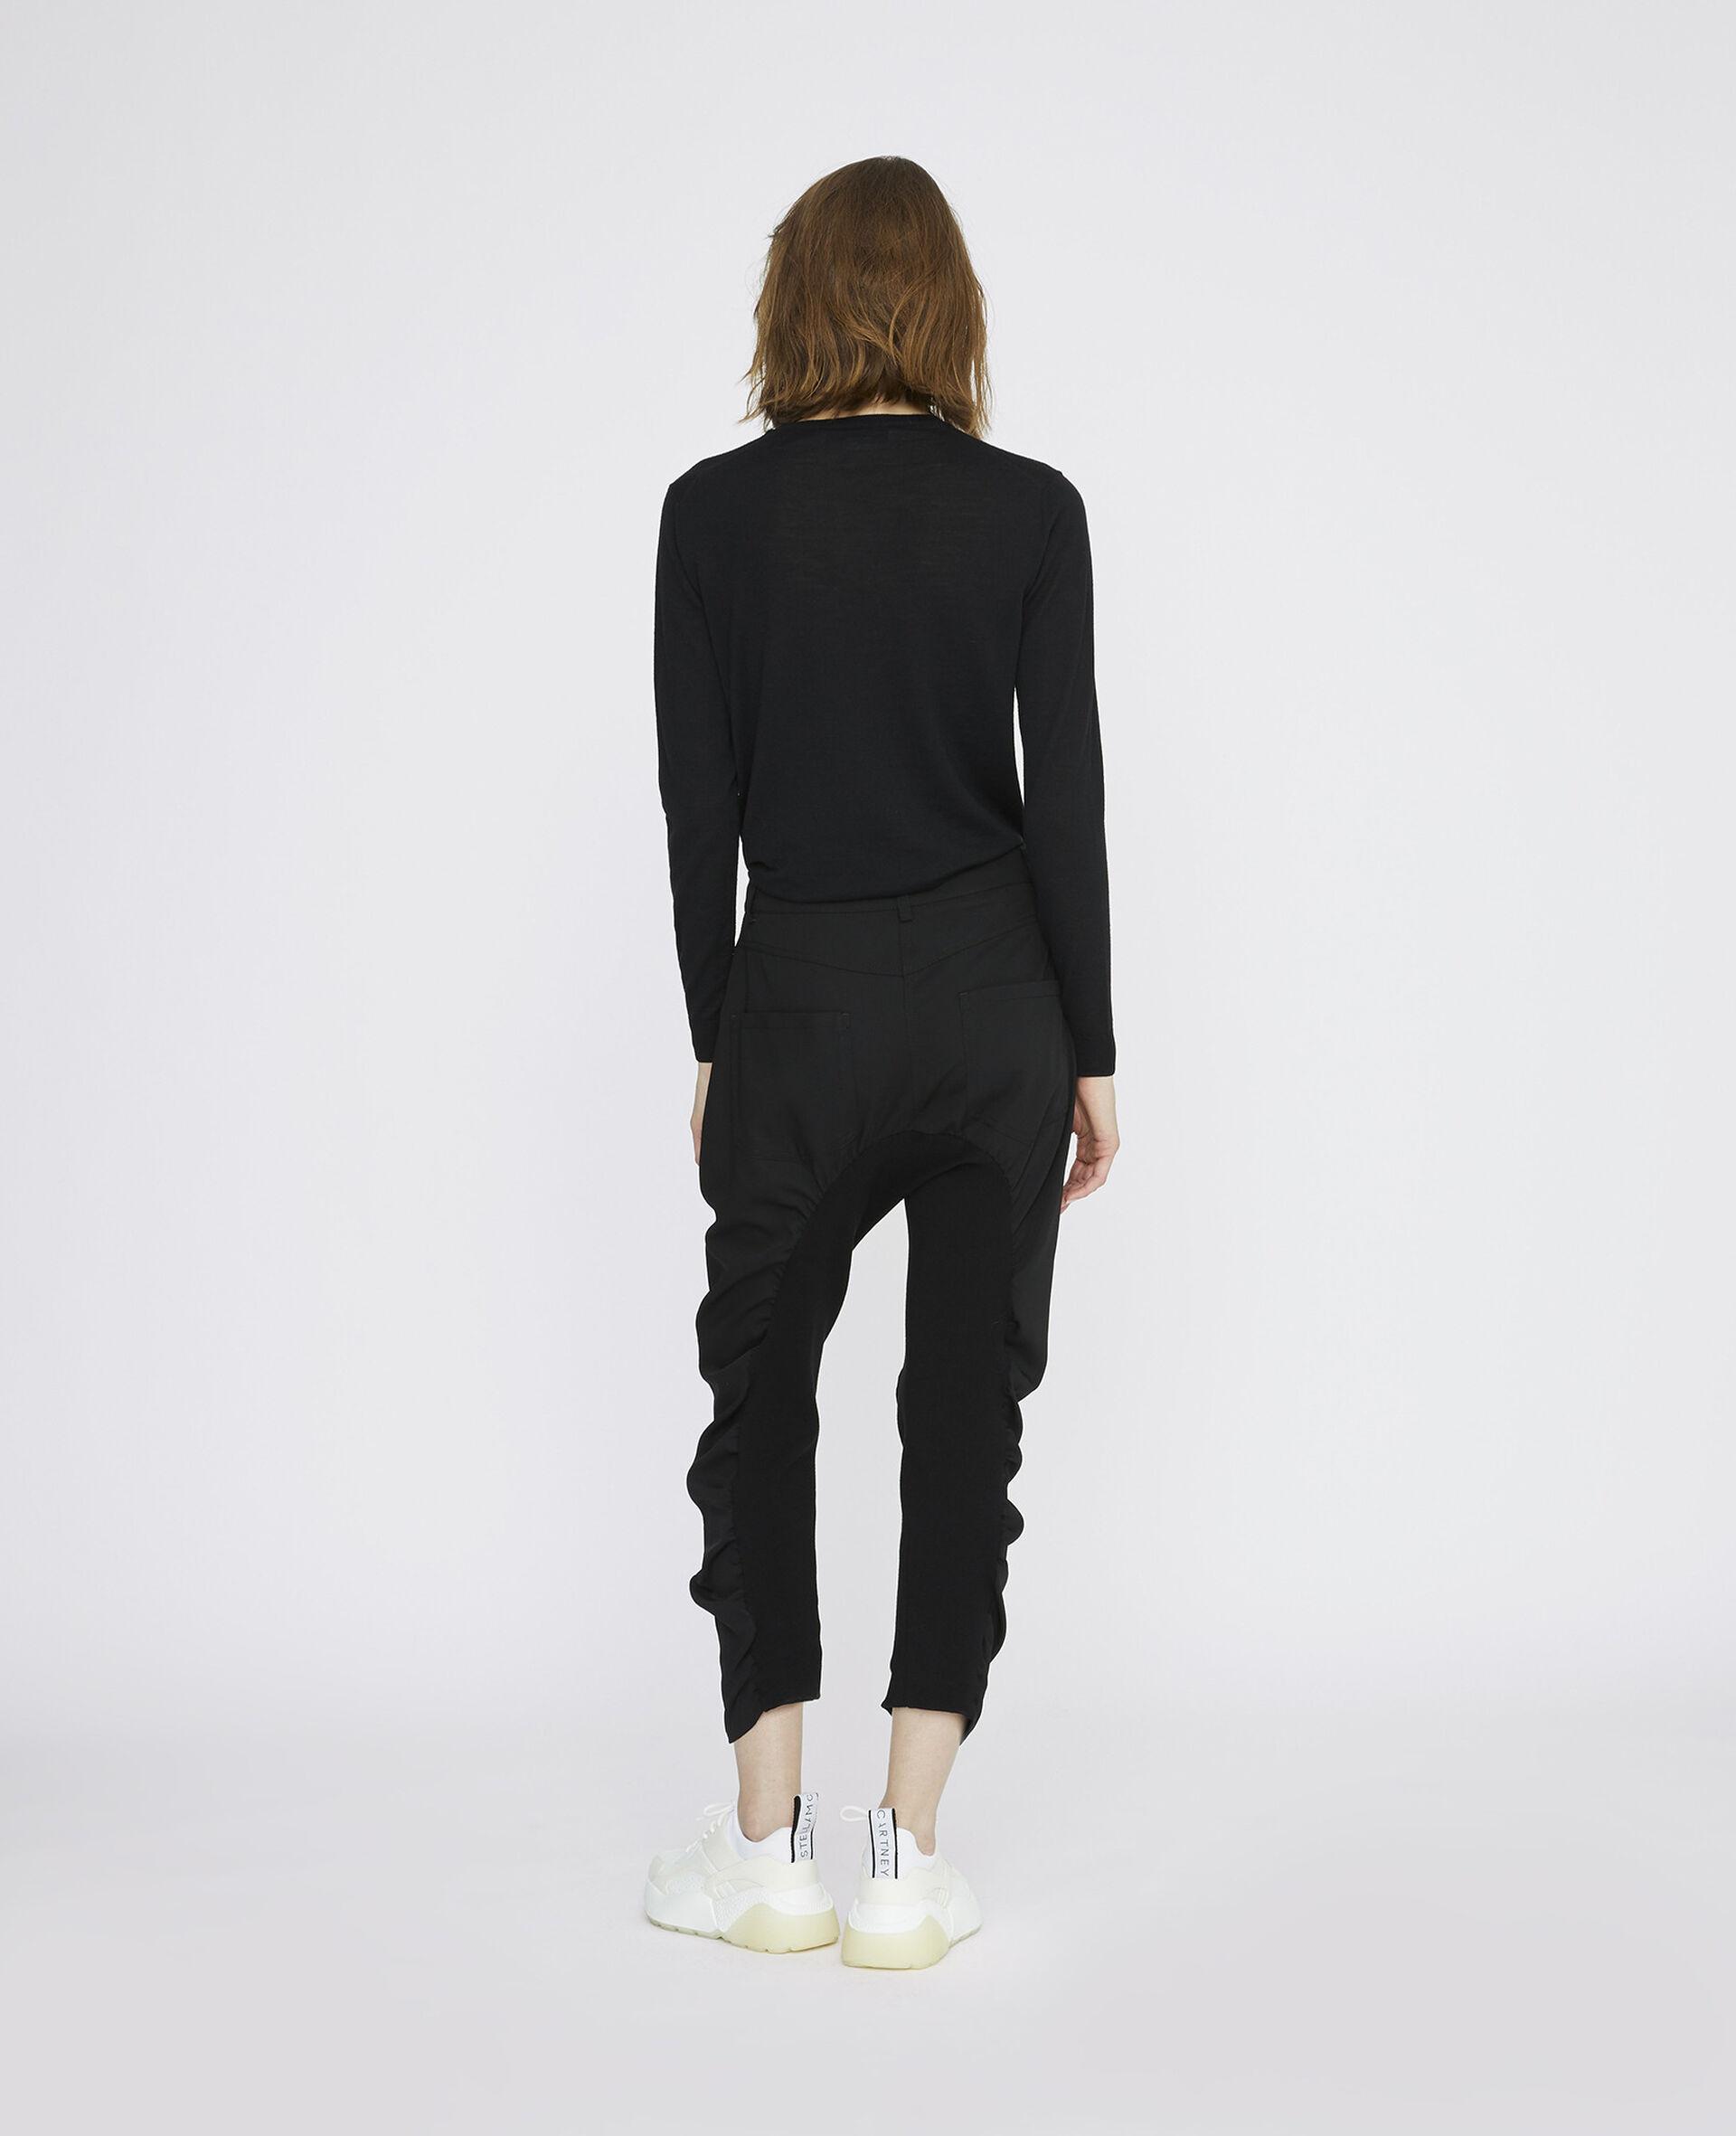 Pantaloni Tina Neri-Nero-large image number 2